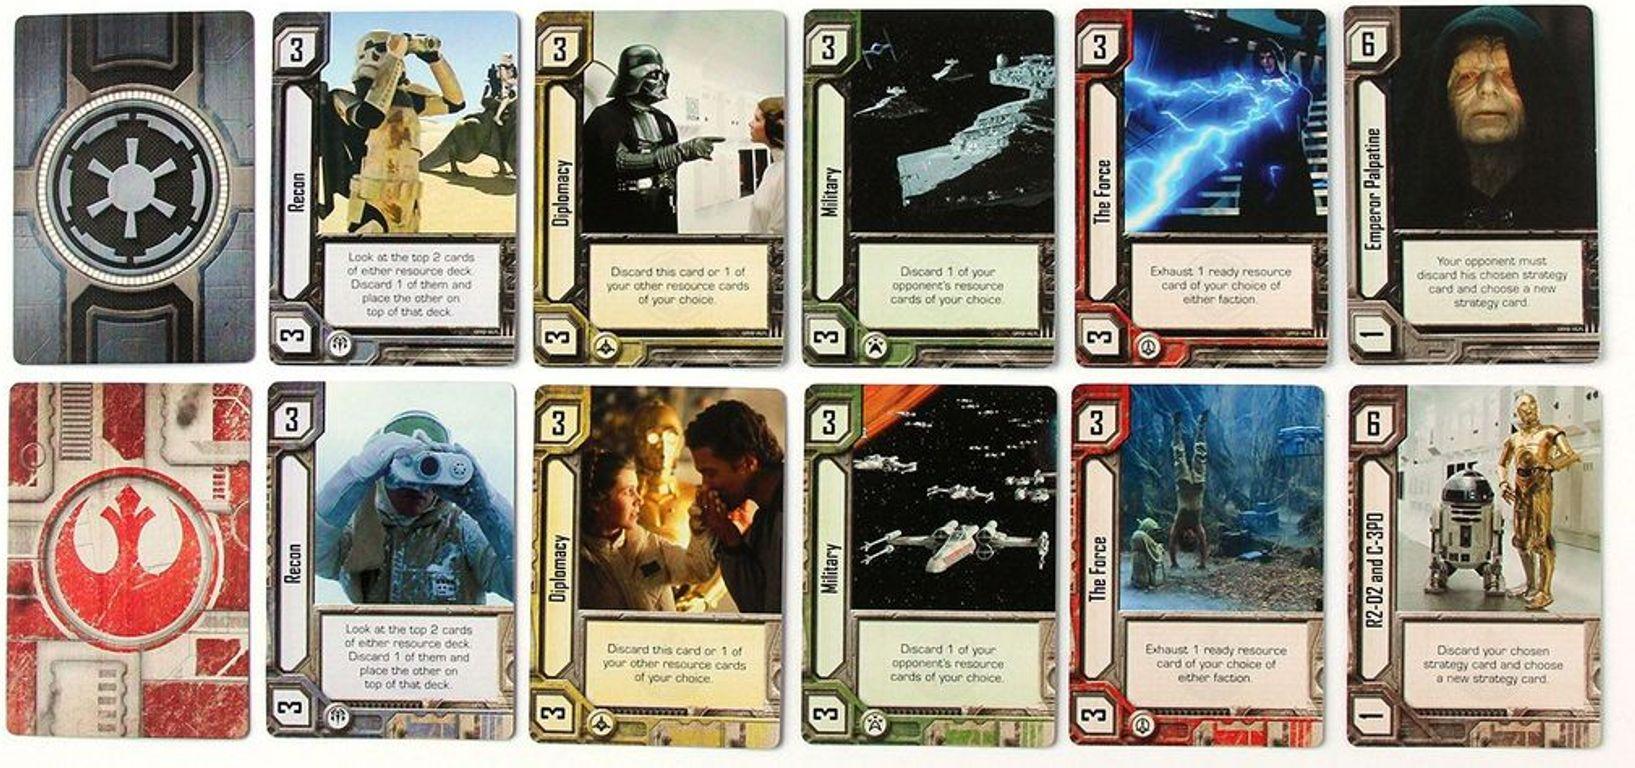 Star Wars: Empire vs. Rebellion cards